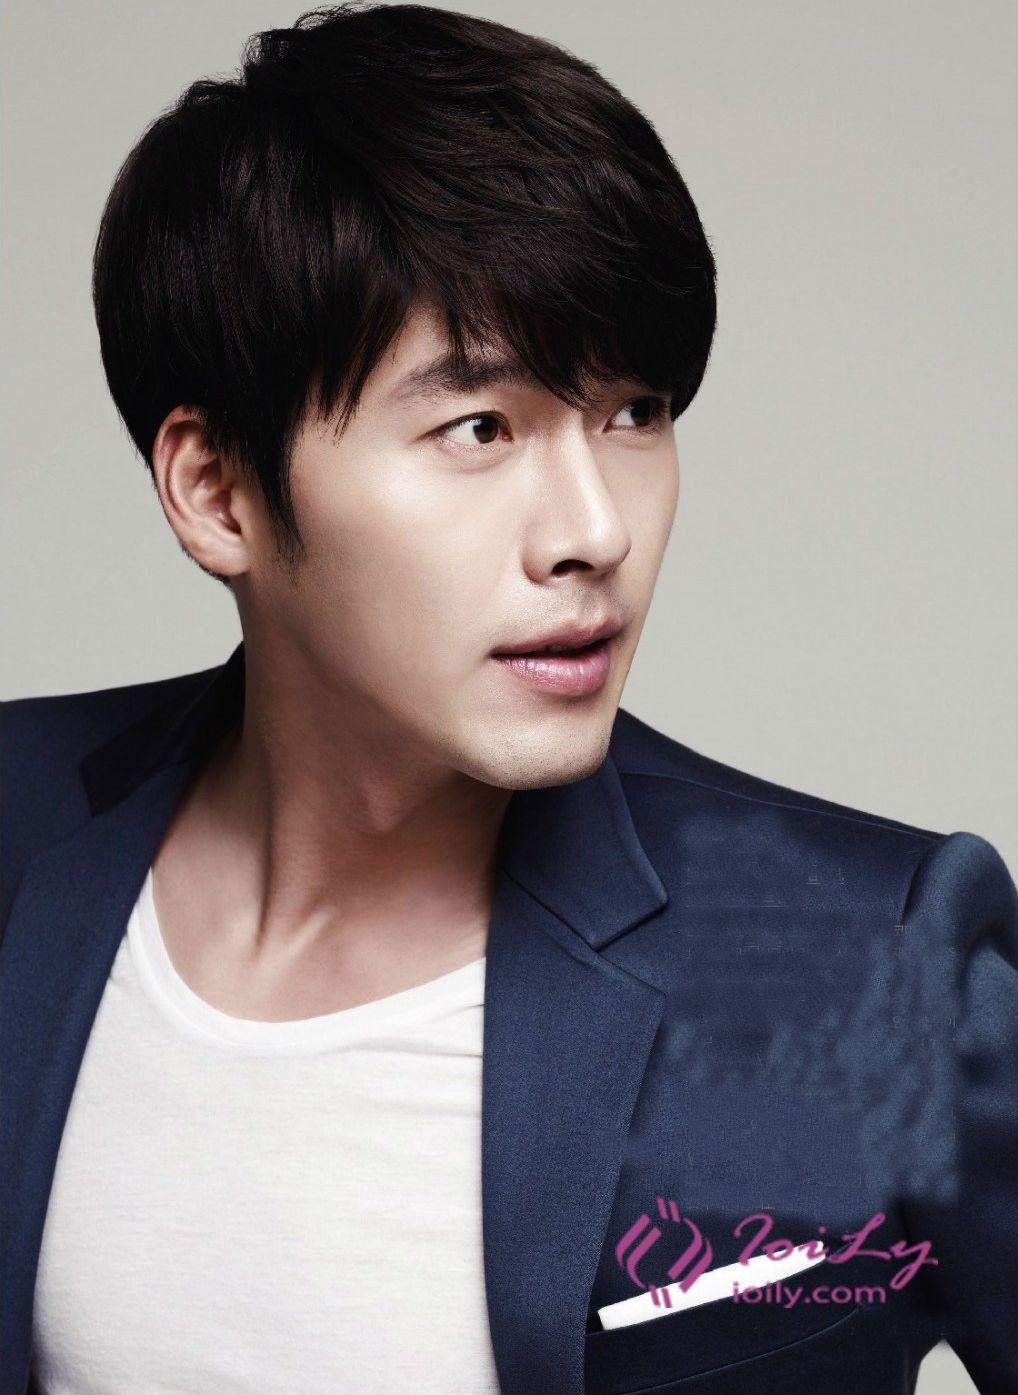 Miraculous Korean Hairstyles Men Short Hair And For Men On Pinterest Short Hairstyles Gunalazisus